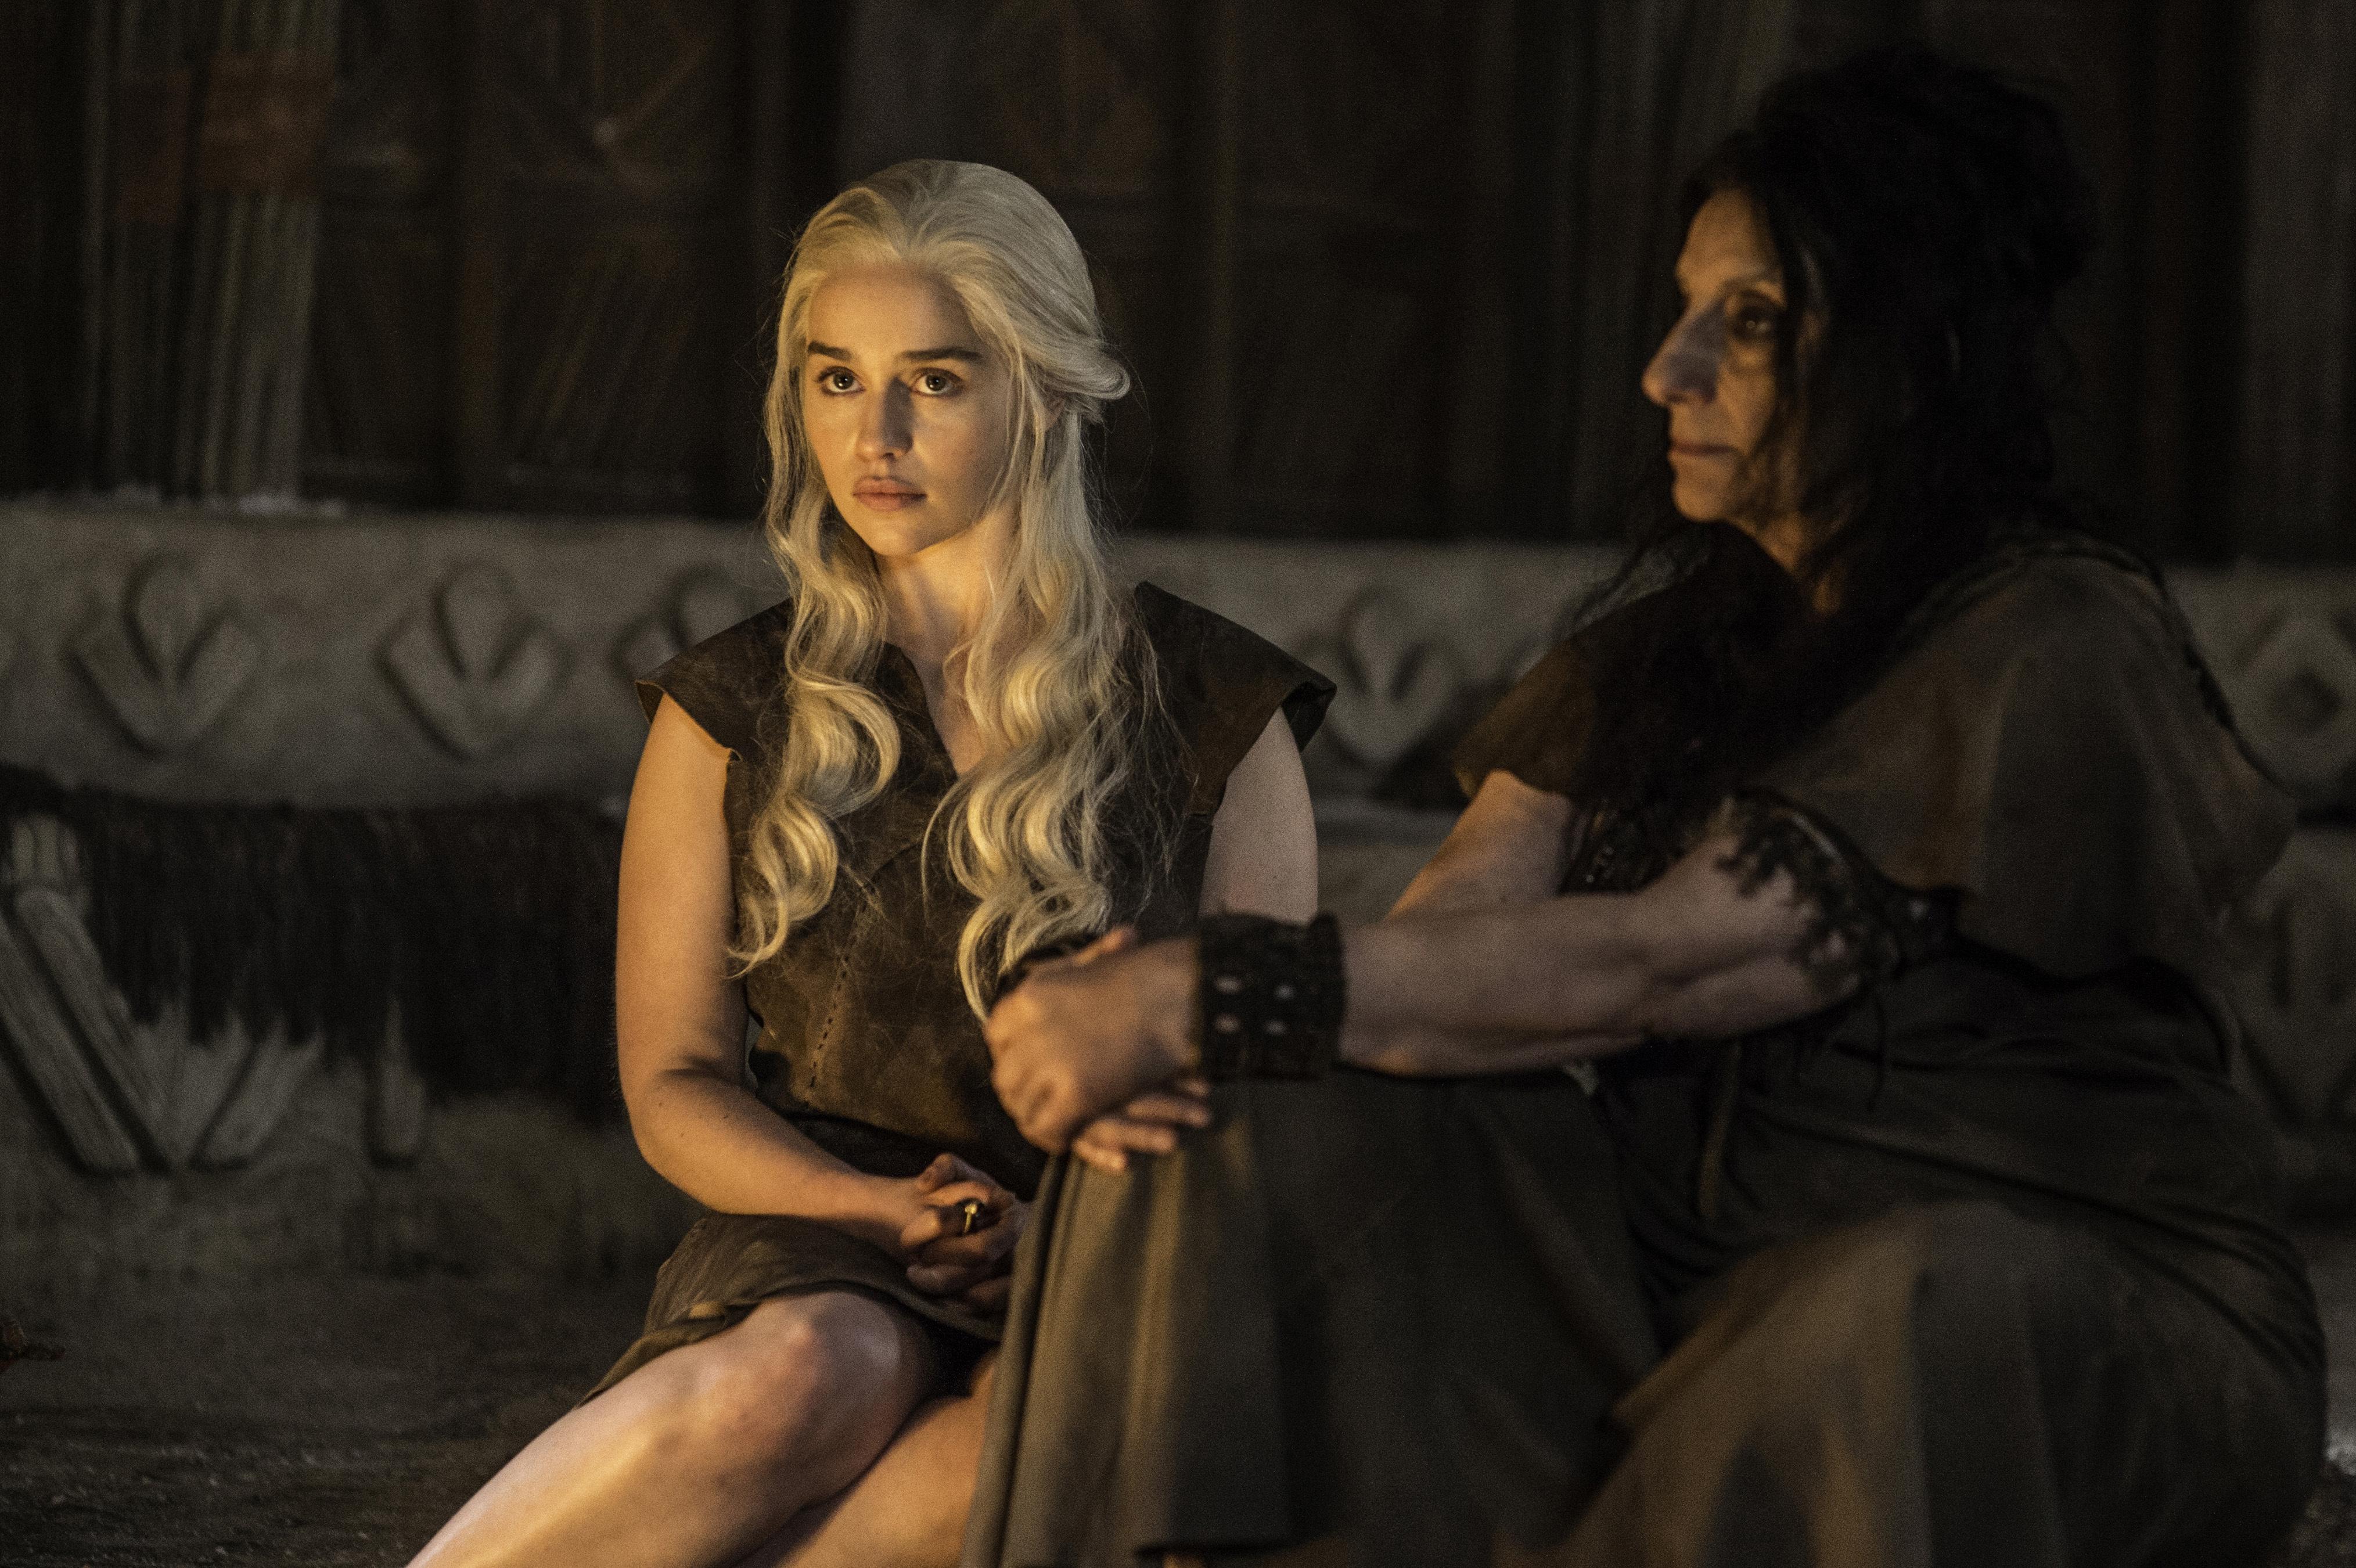 Clarke nude emilia got The Emilia